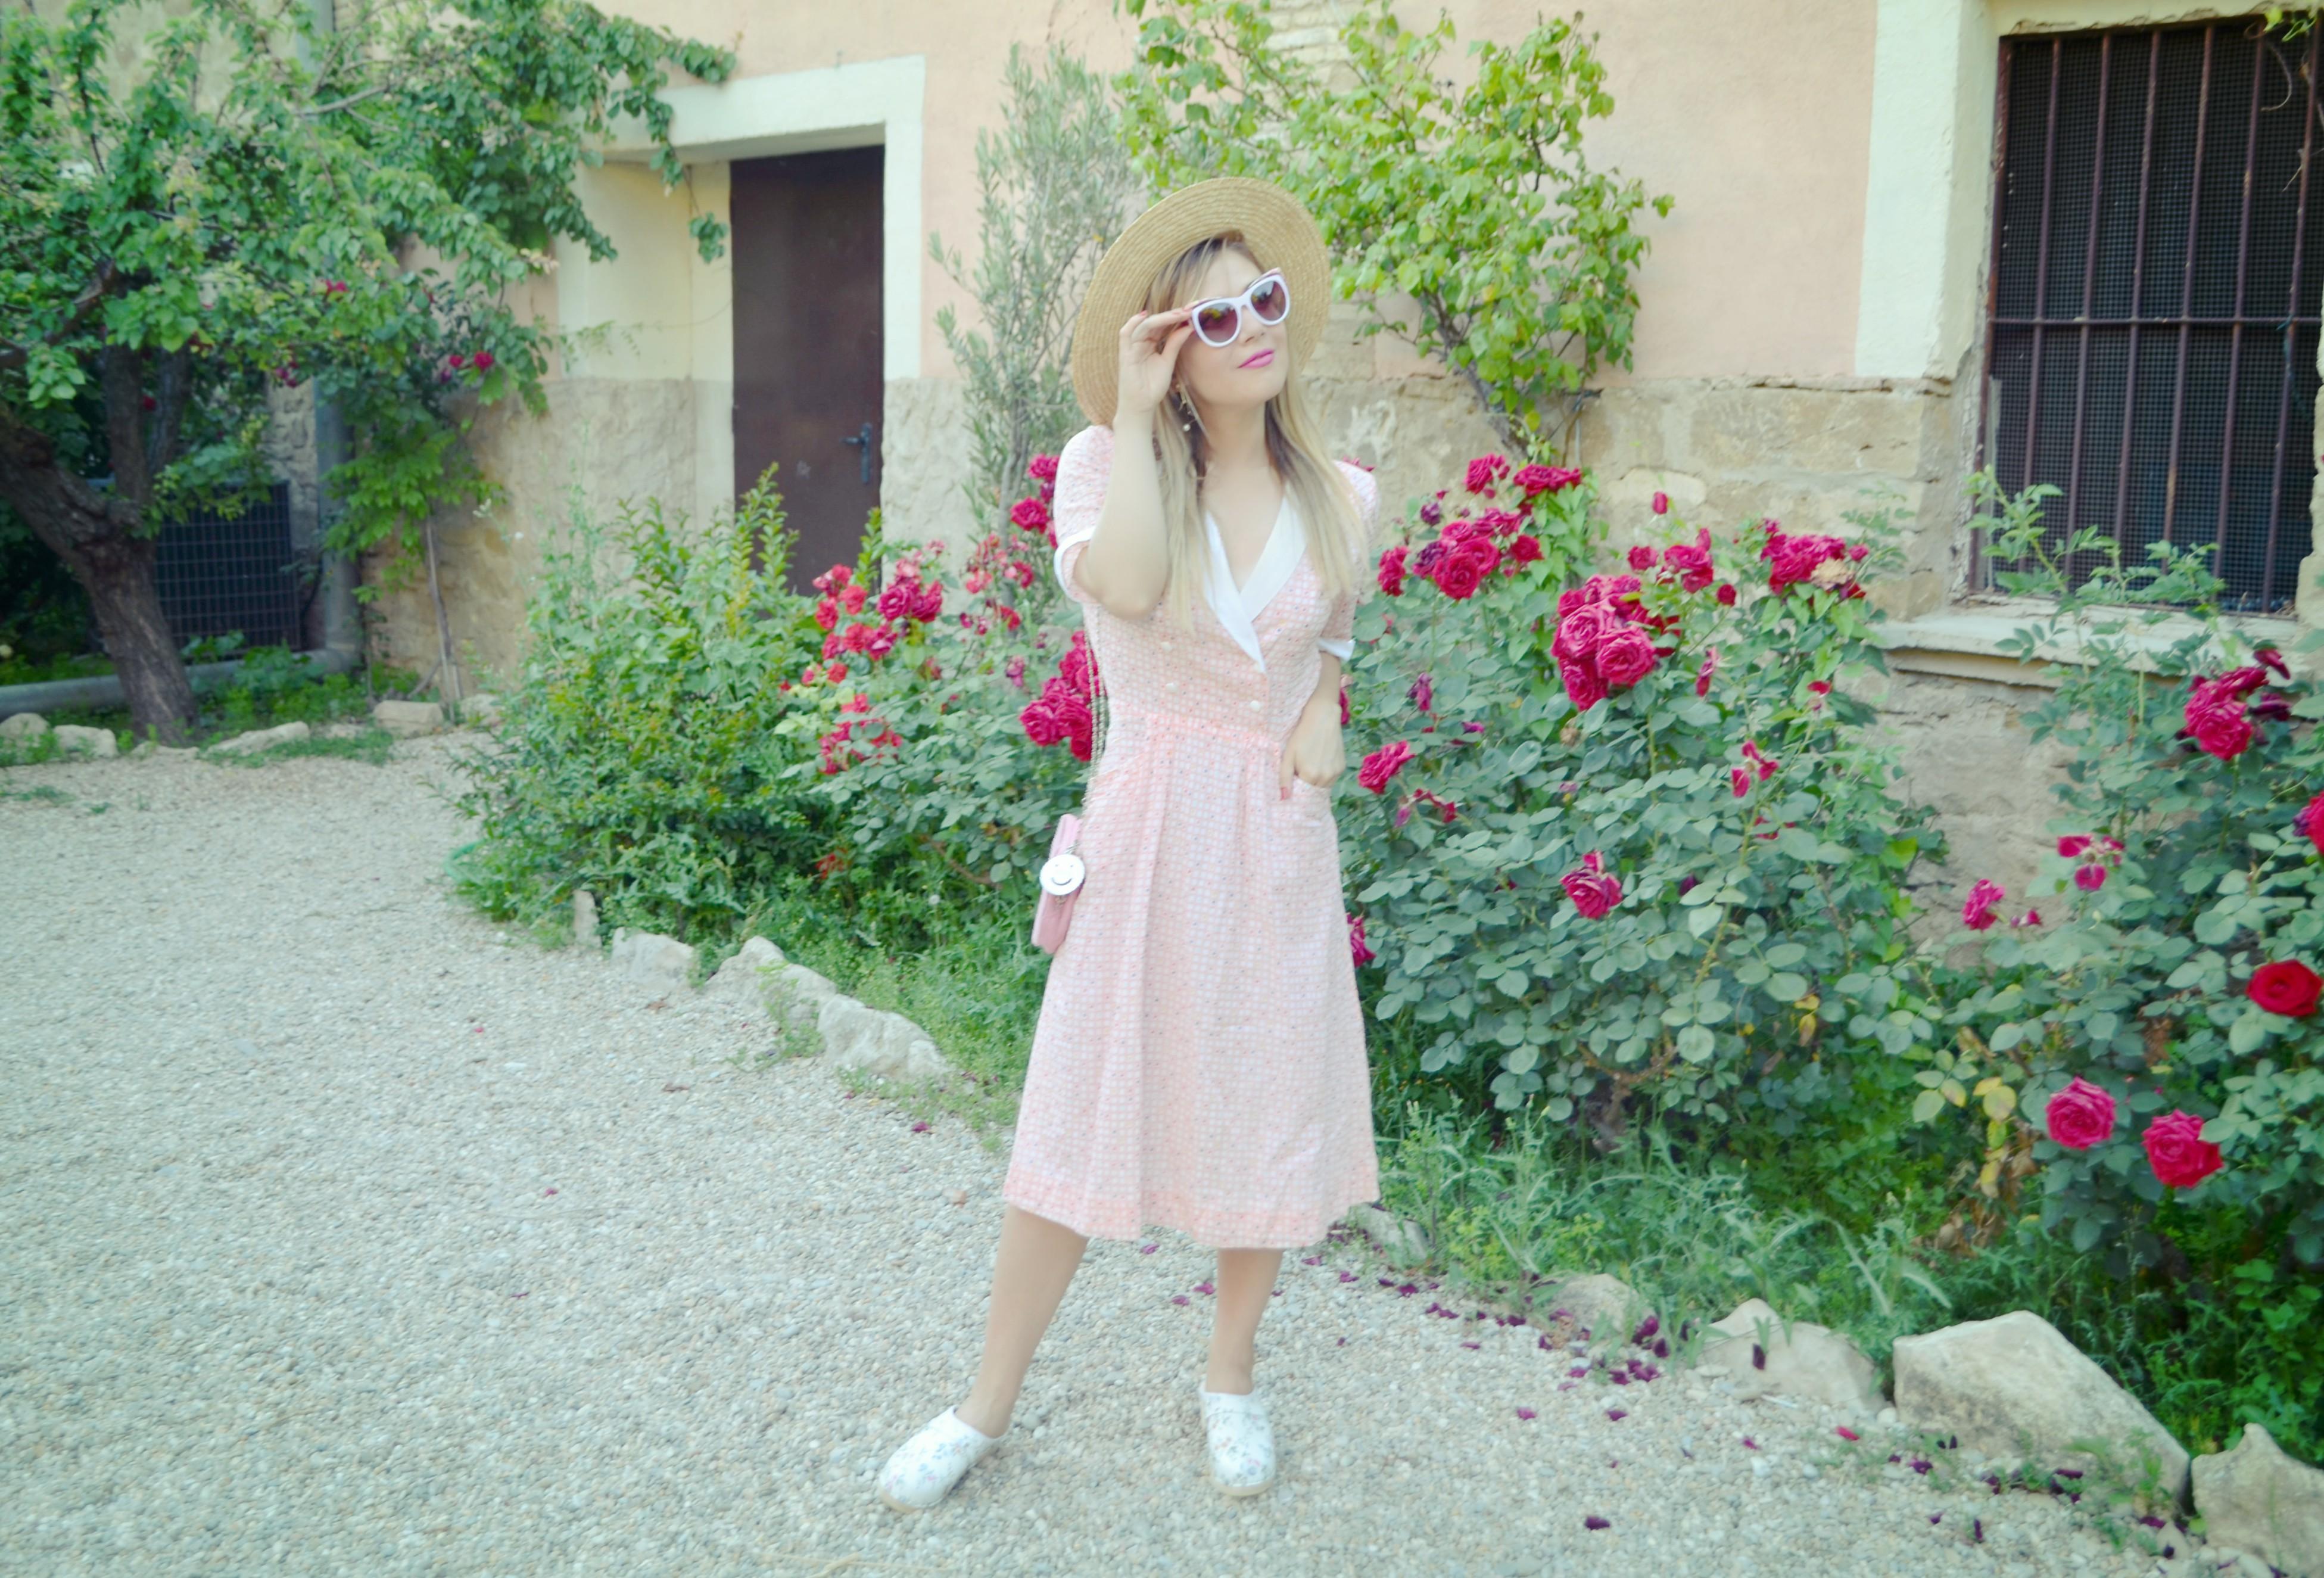 Vintage-dress-fancy-style-blog-de-moda-ChicAdicta-fashionista-Chic-Adicta-agatharuizdelaprada-sunglasses-Piensa-en-Chic-PiensaenChic